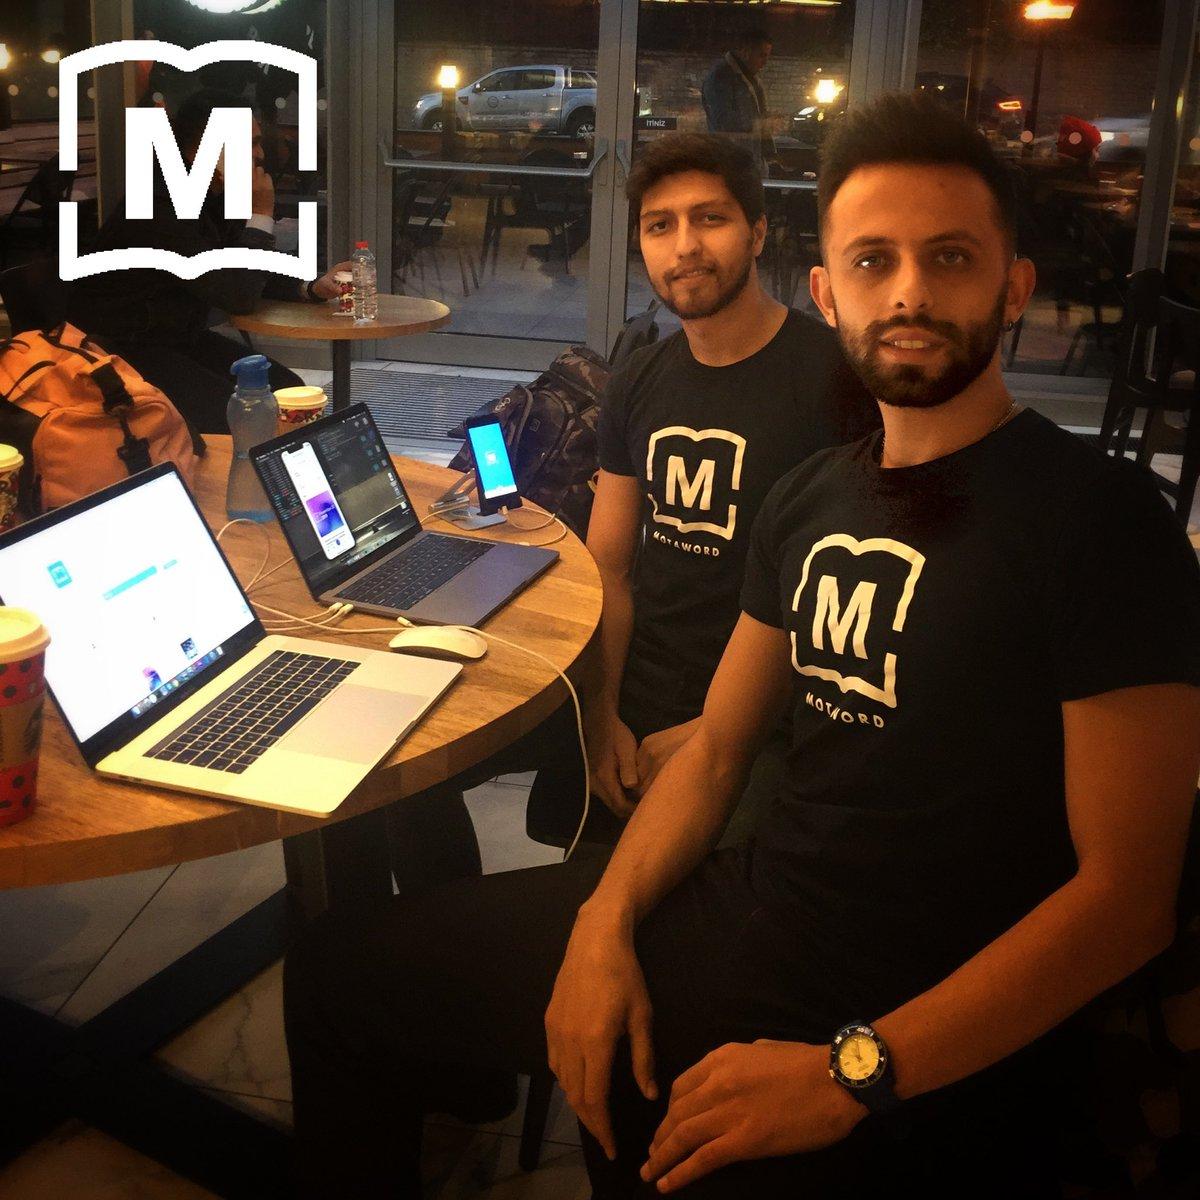 We're about to release MotaWord v2.   #translation #mobileapps <br>http://pic.twitter.com/VGTikjruIu